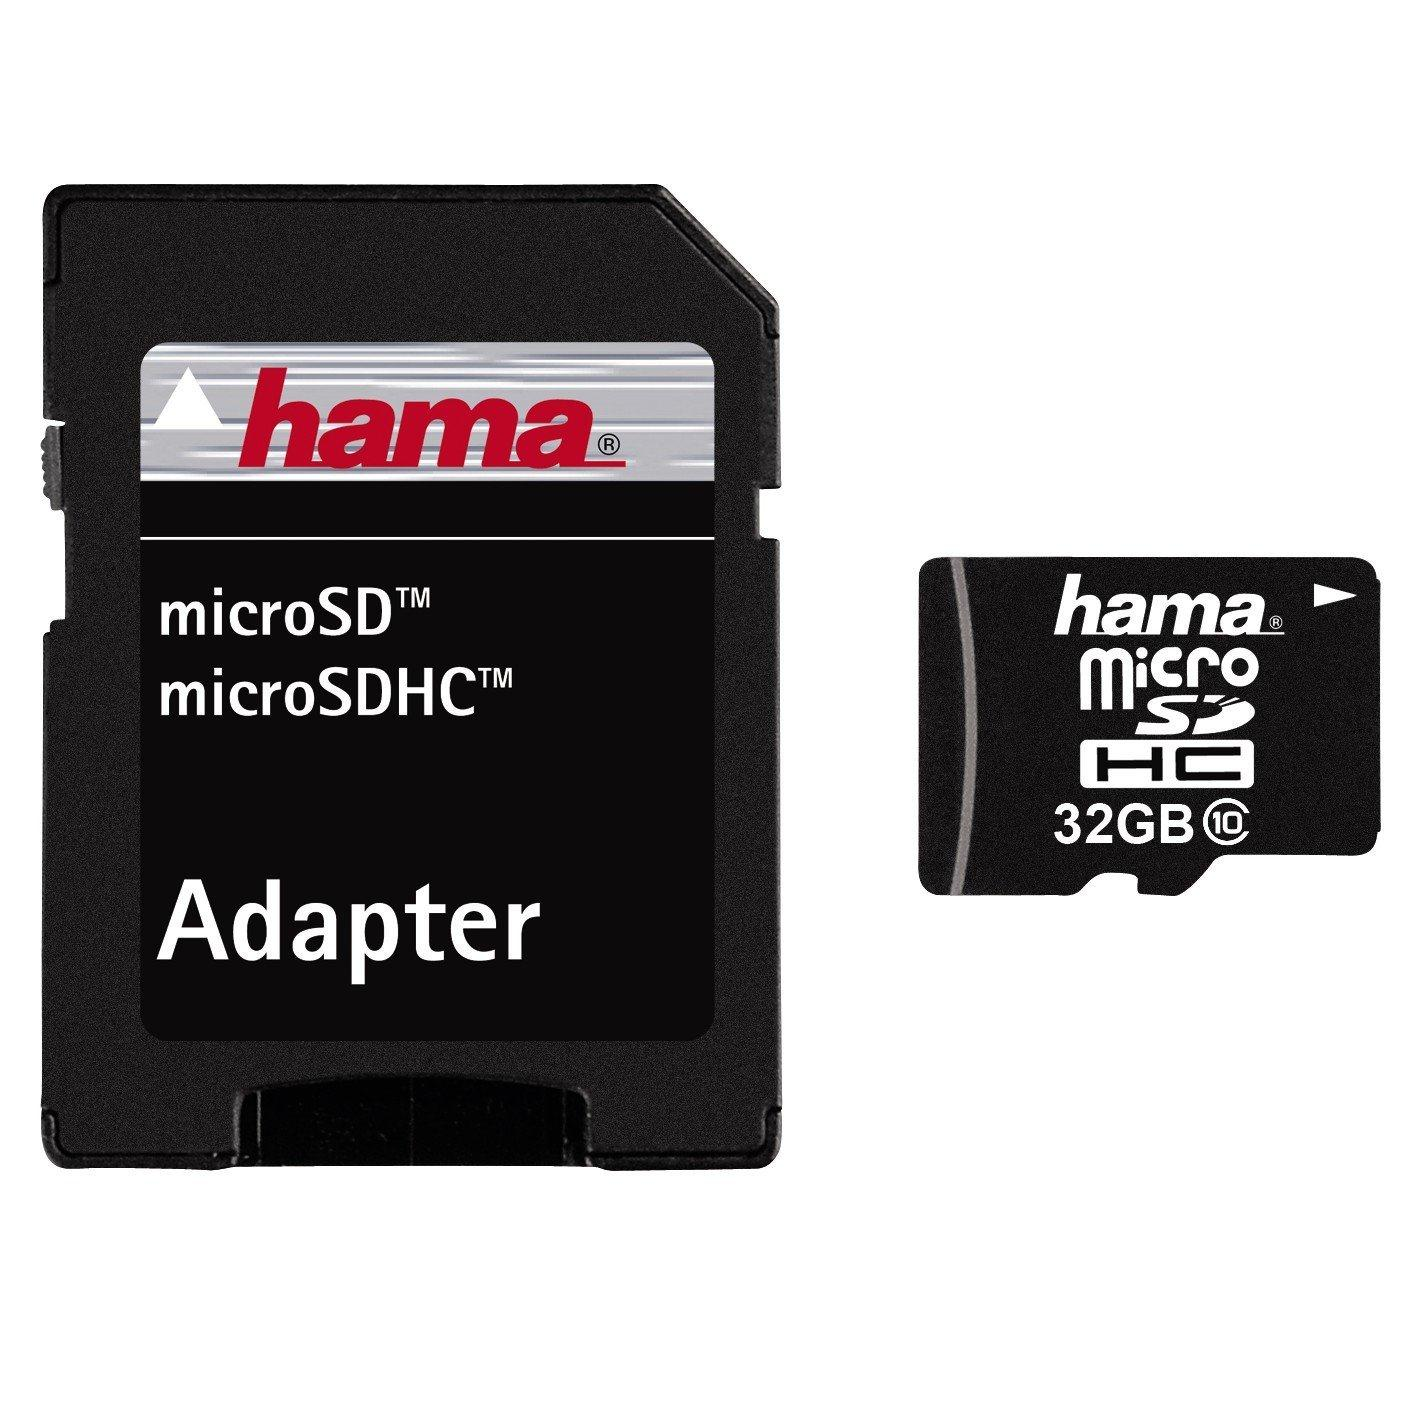 Hama (32GB) microSDHC Memory Card 22MB/s (Class 10) + SD Adaptor